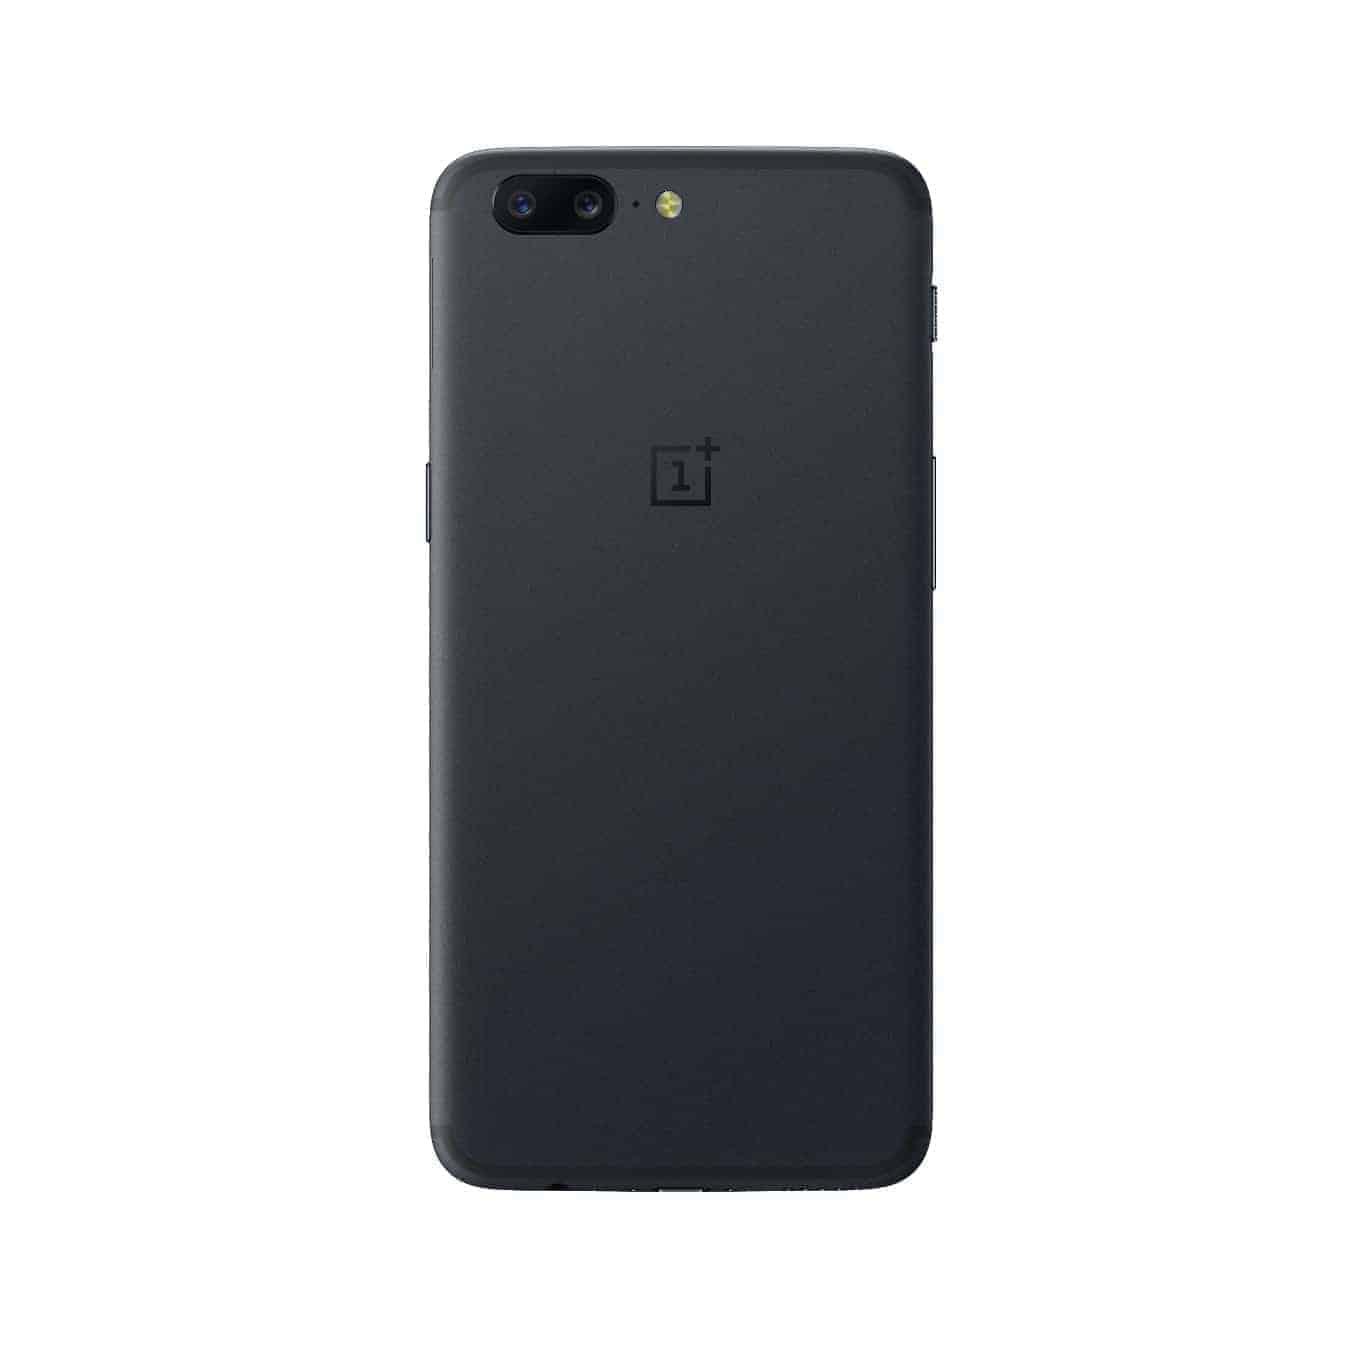 OnePlus 5 Slate Gray 9